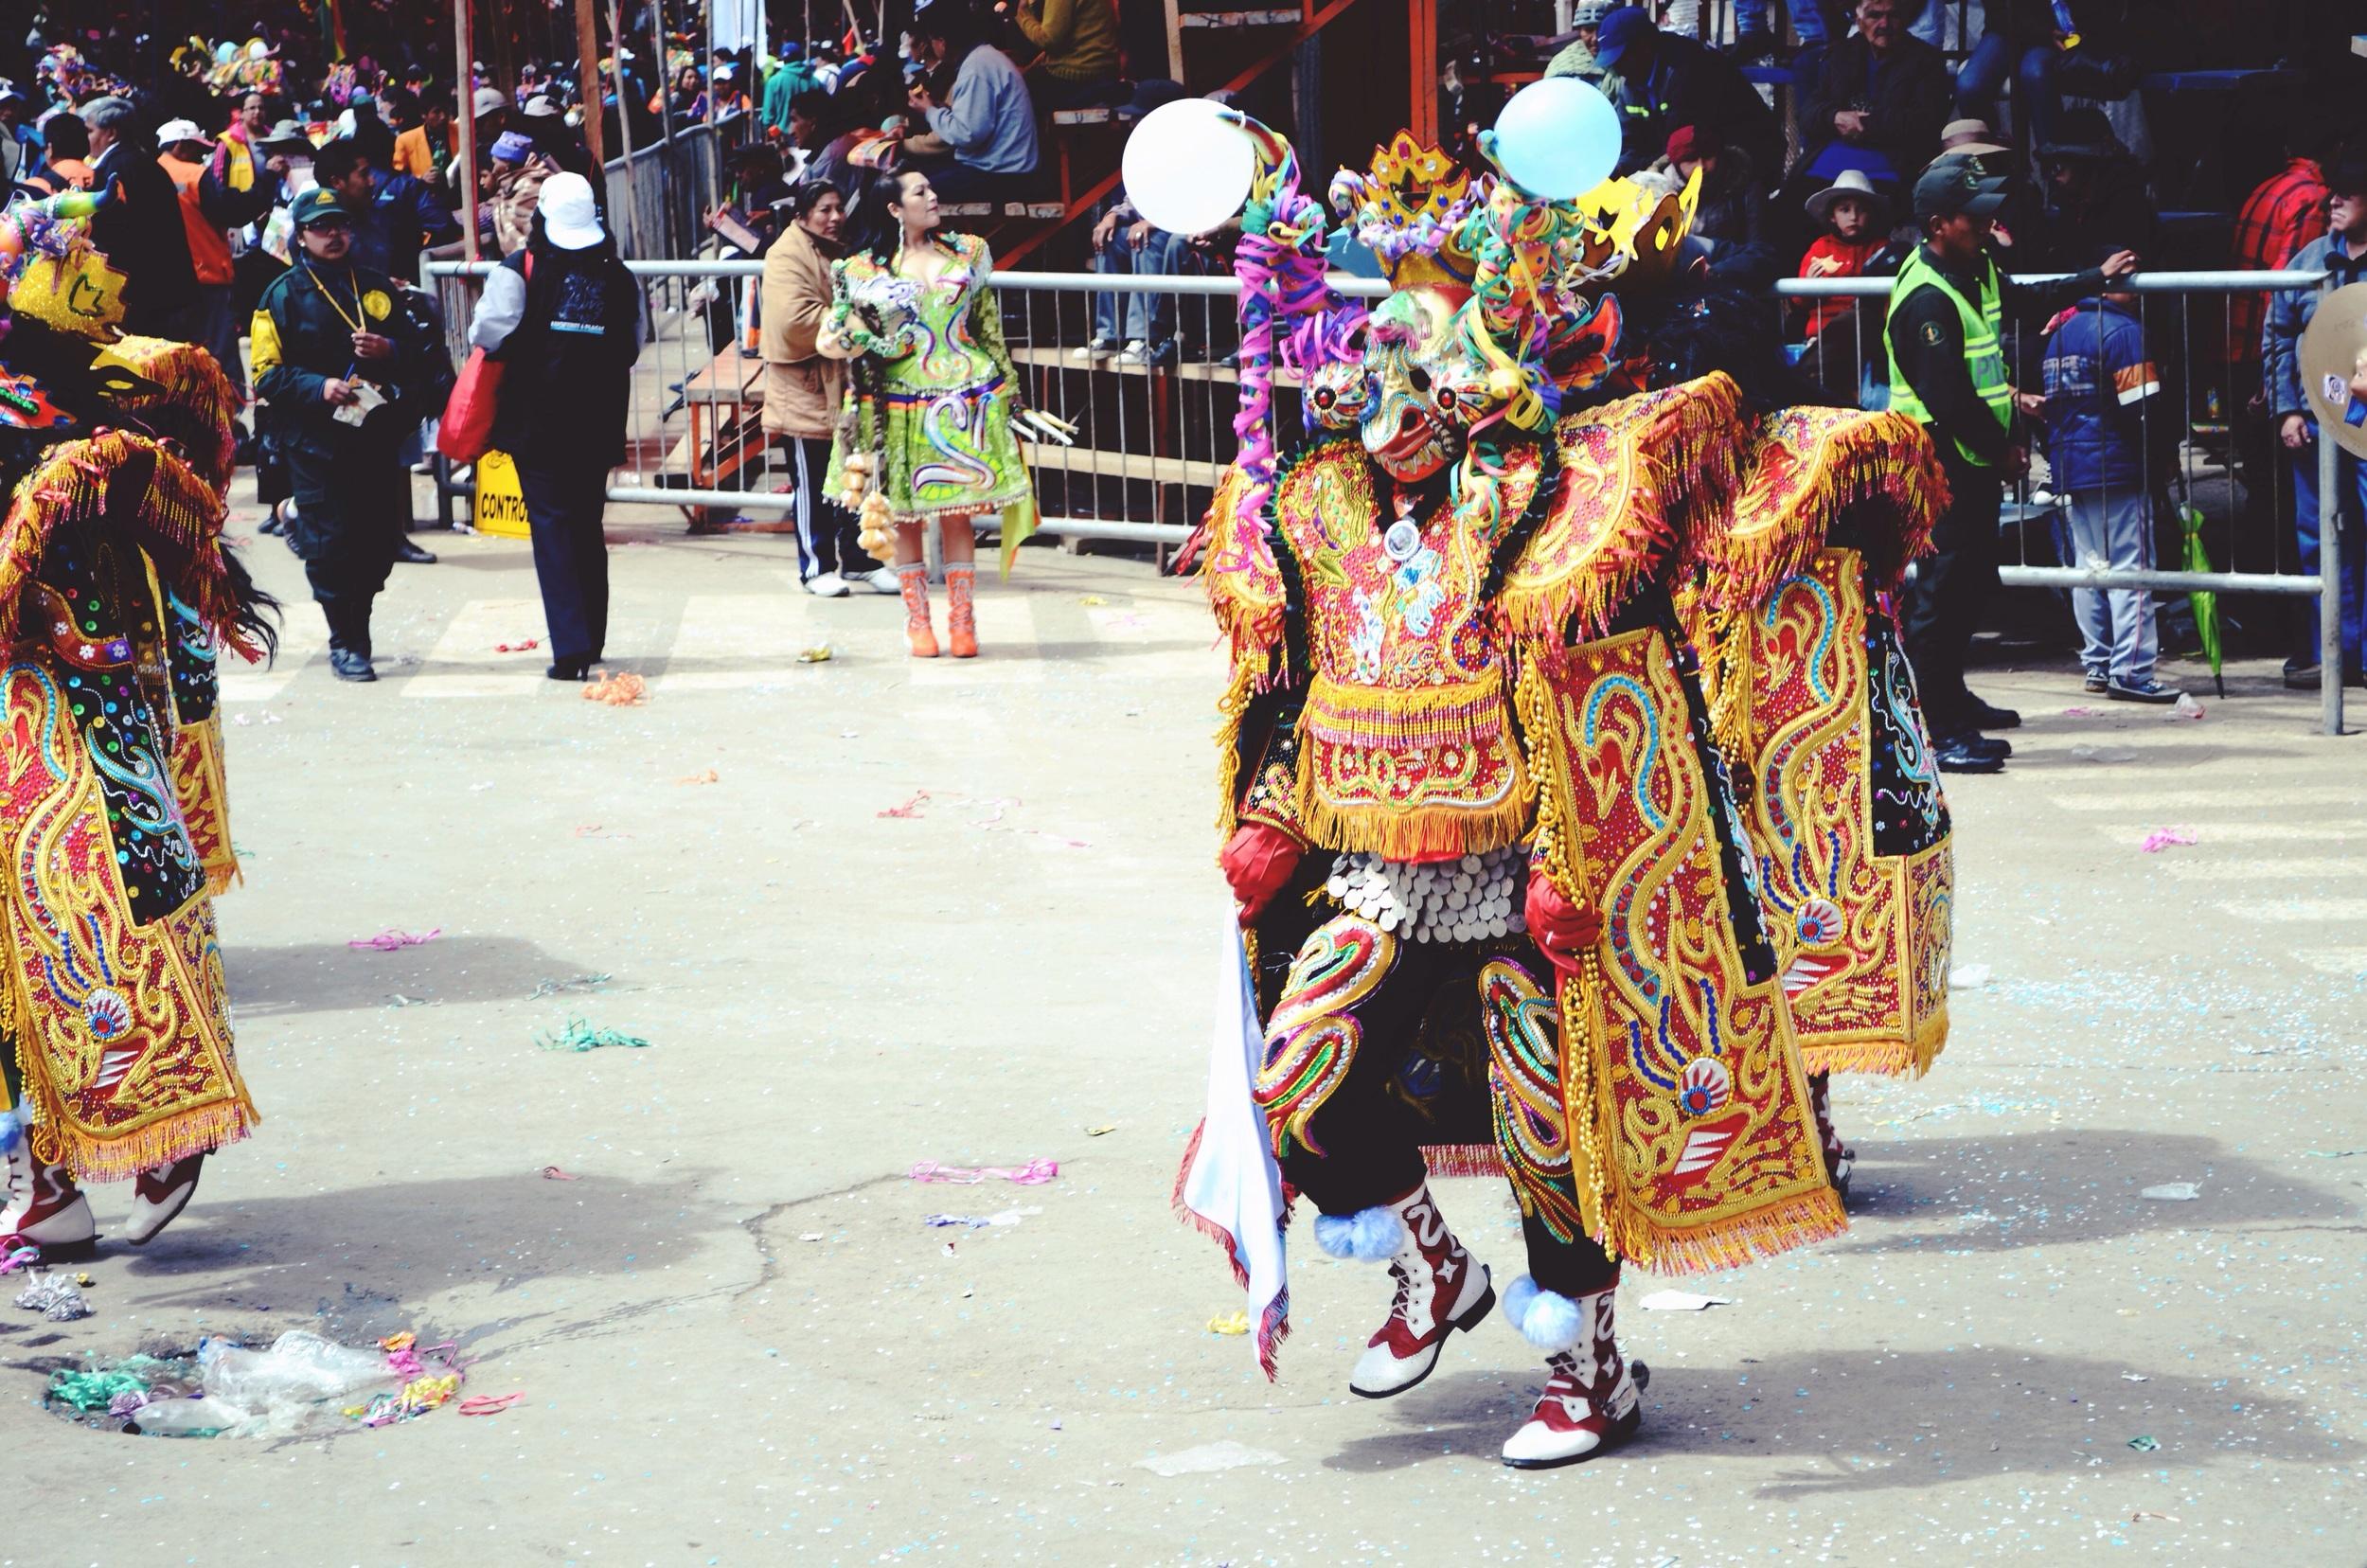 El diablo - the devil - character of Carnaval // 15 february 2015